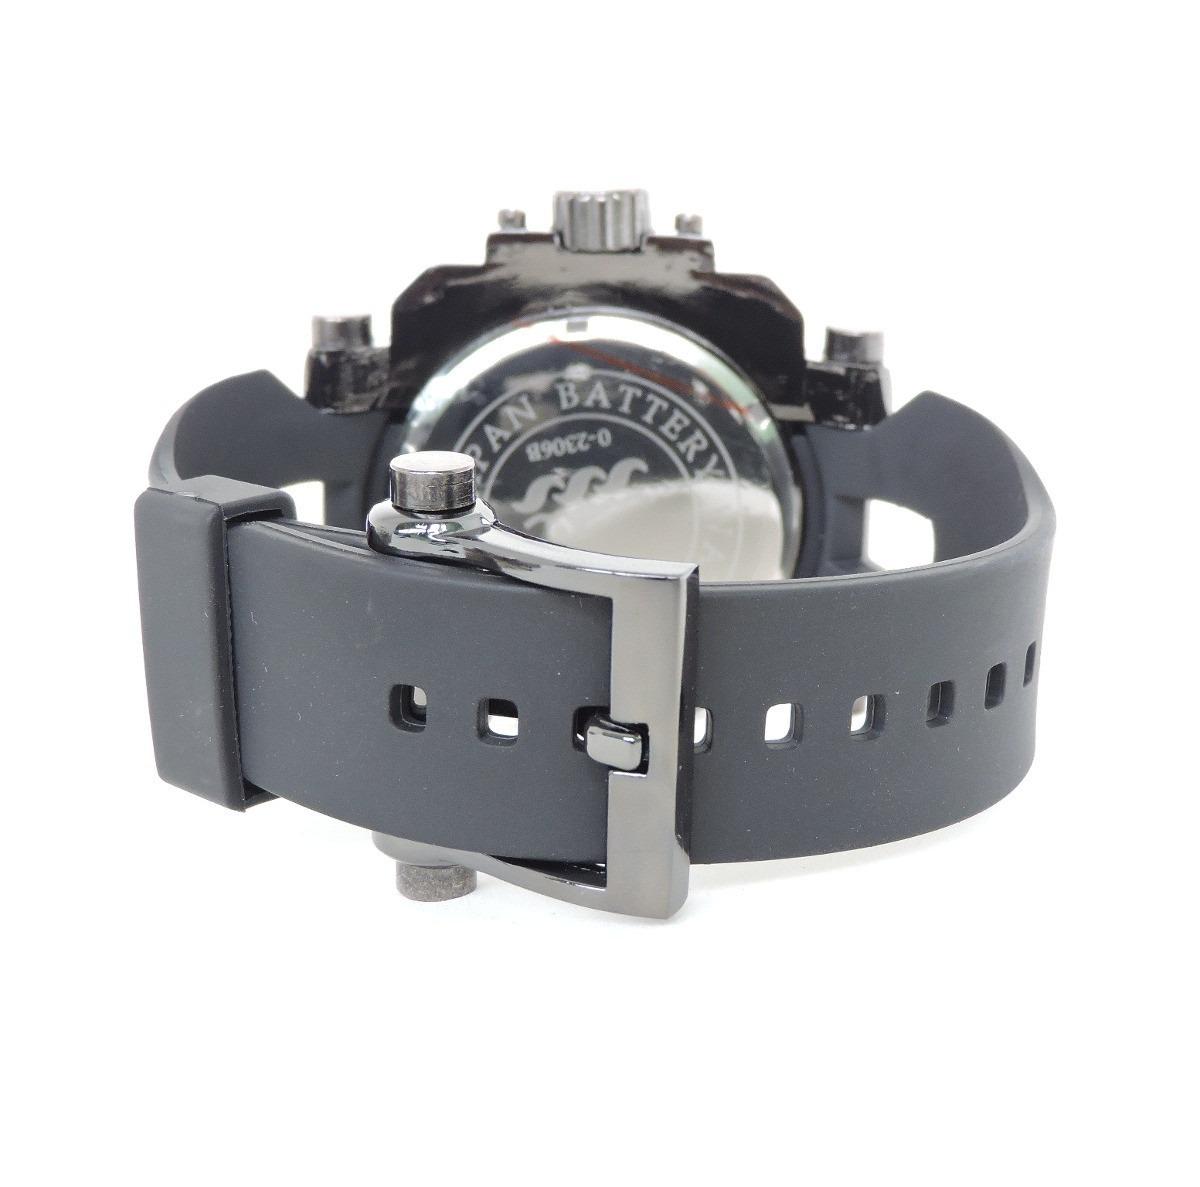 f309f2f89f3 Relógio Oakley Gearbox - Promocao Com Caixa